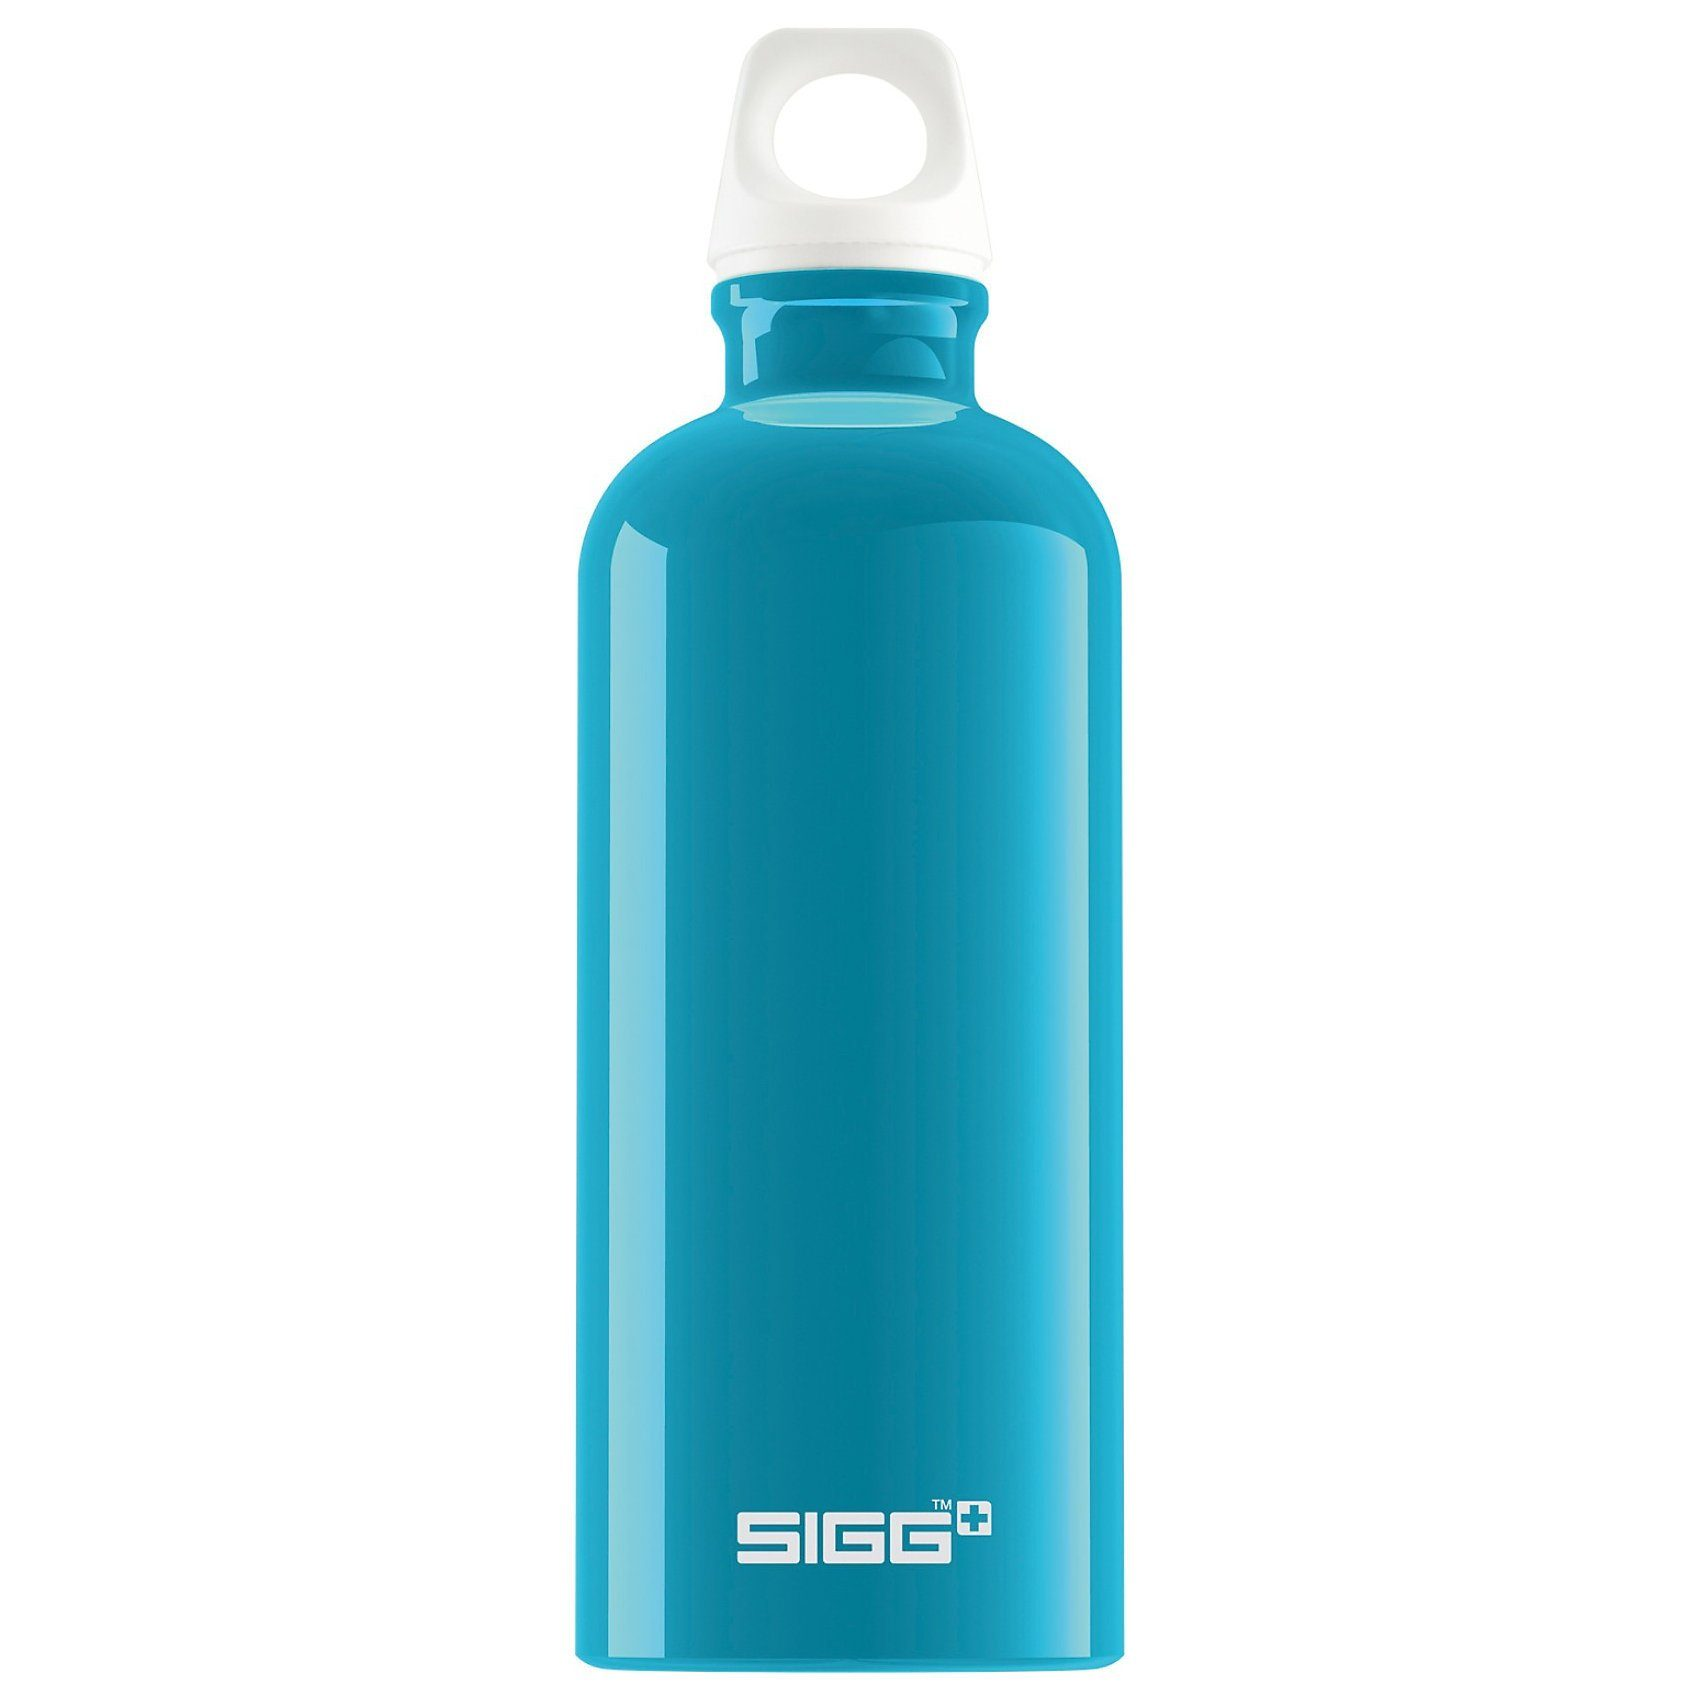 SIGG Alu-Trinkflasche FABULOUS Aqua, 600 ml